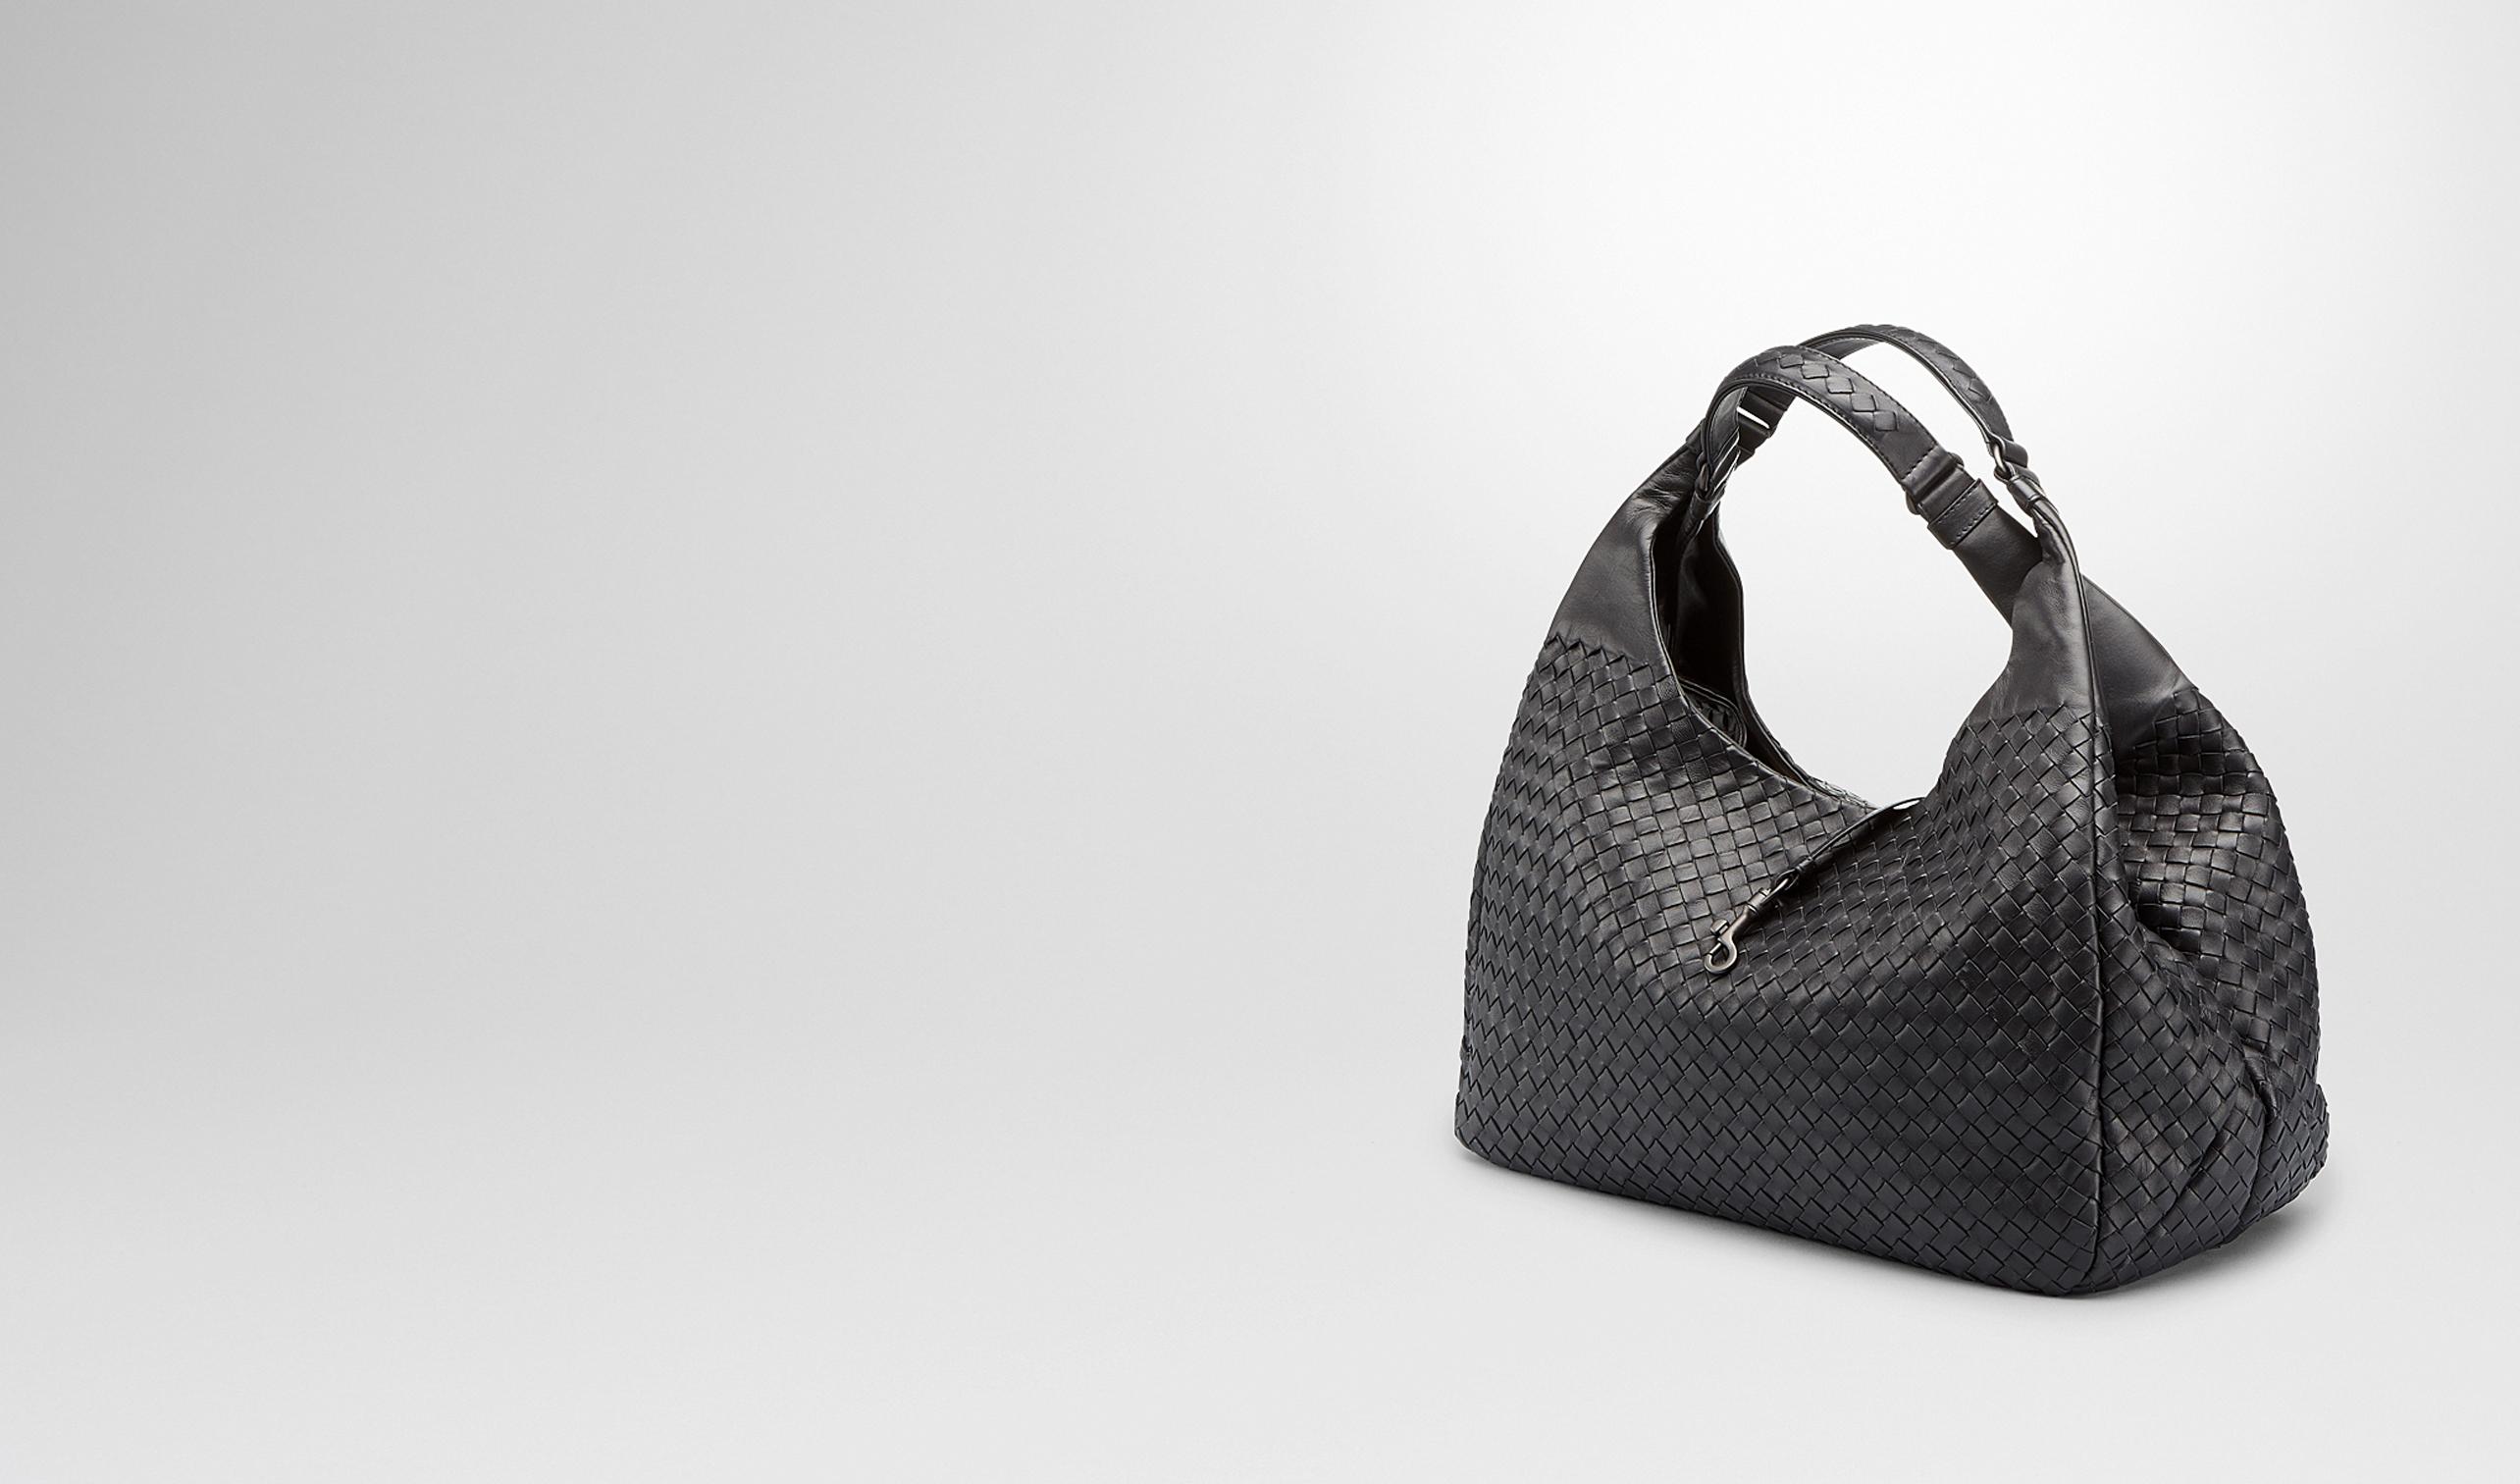 301201 8414 New Auth BOTTEGA VENETA Intrecciomirage Leather Clutch Pouch Bag